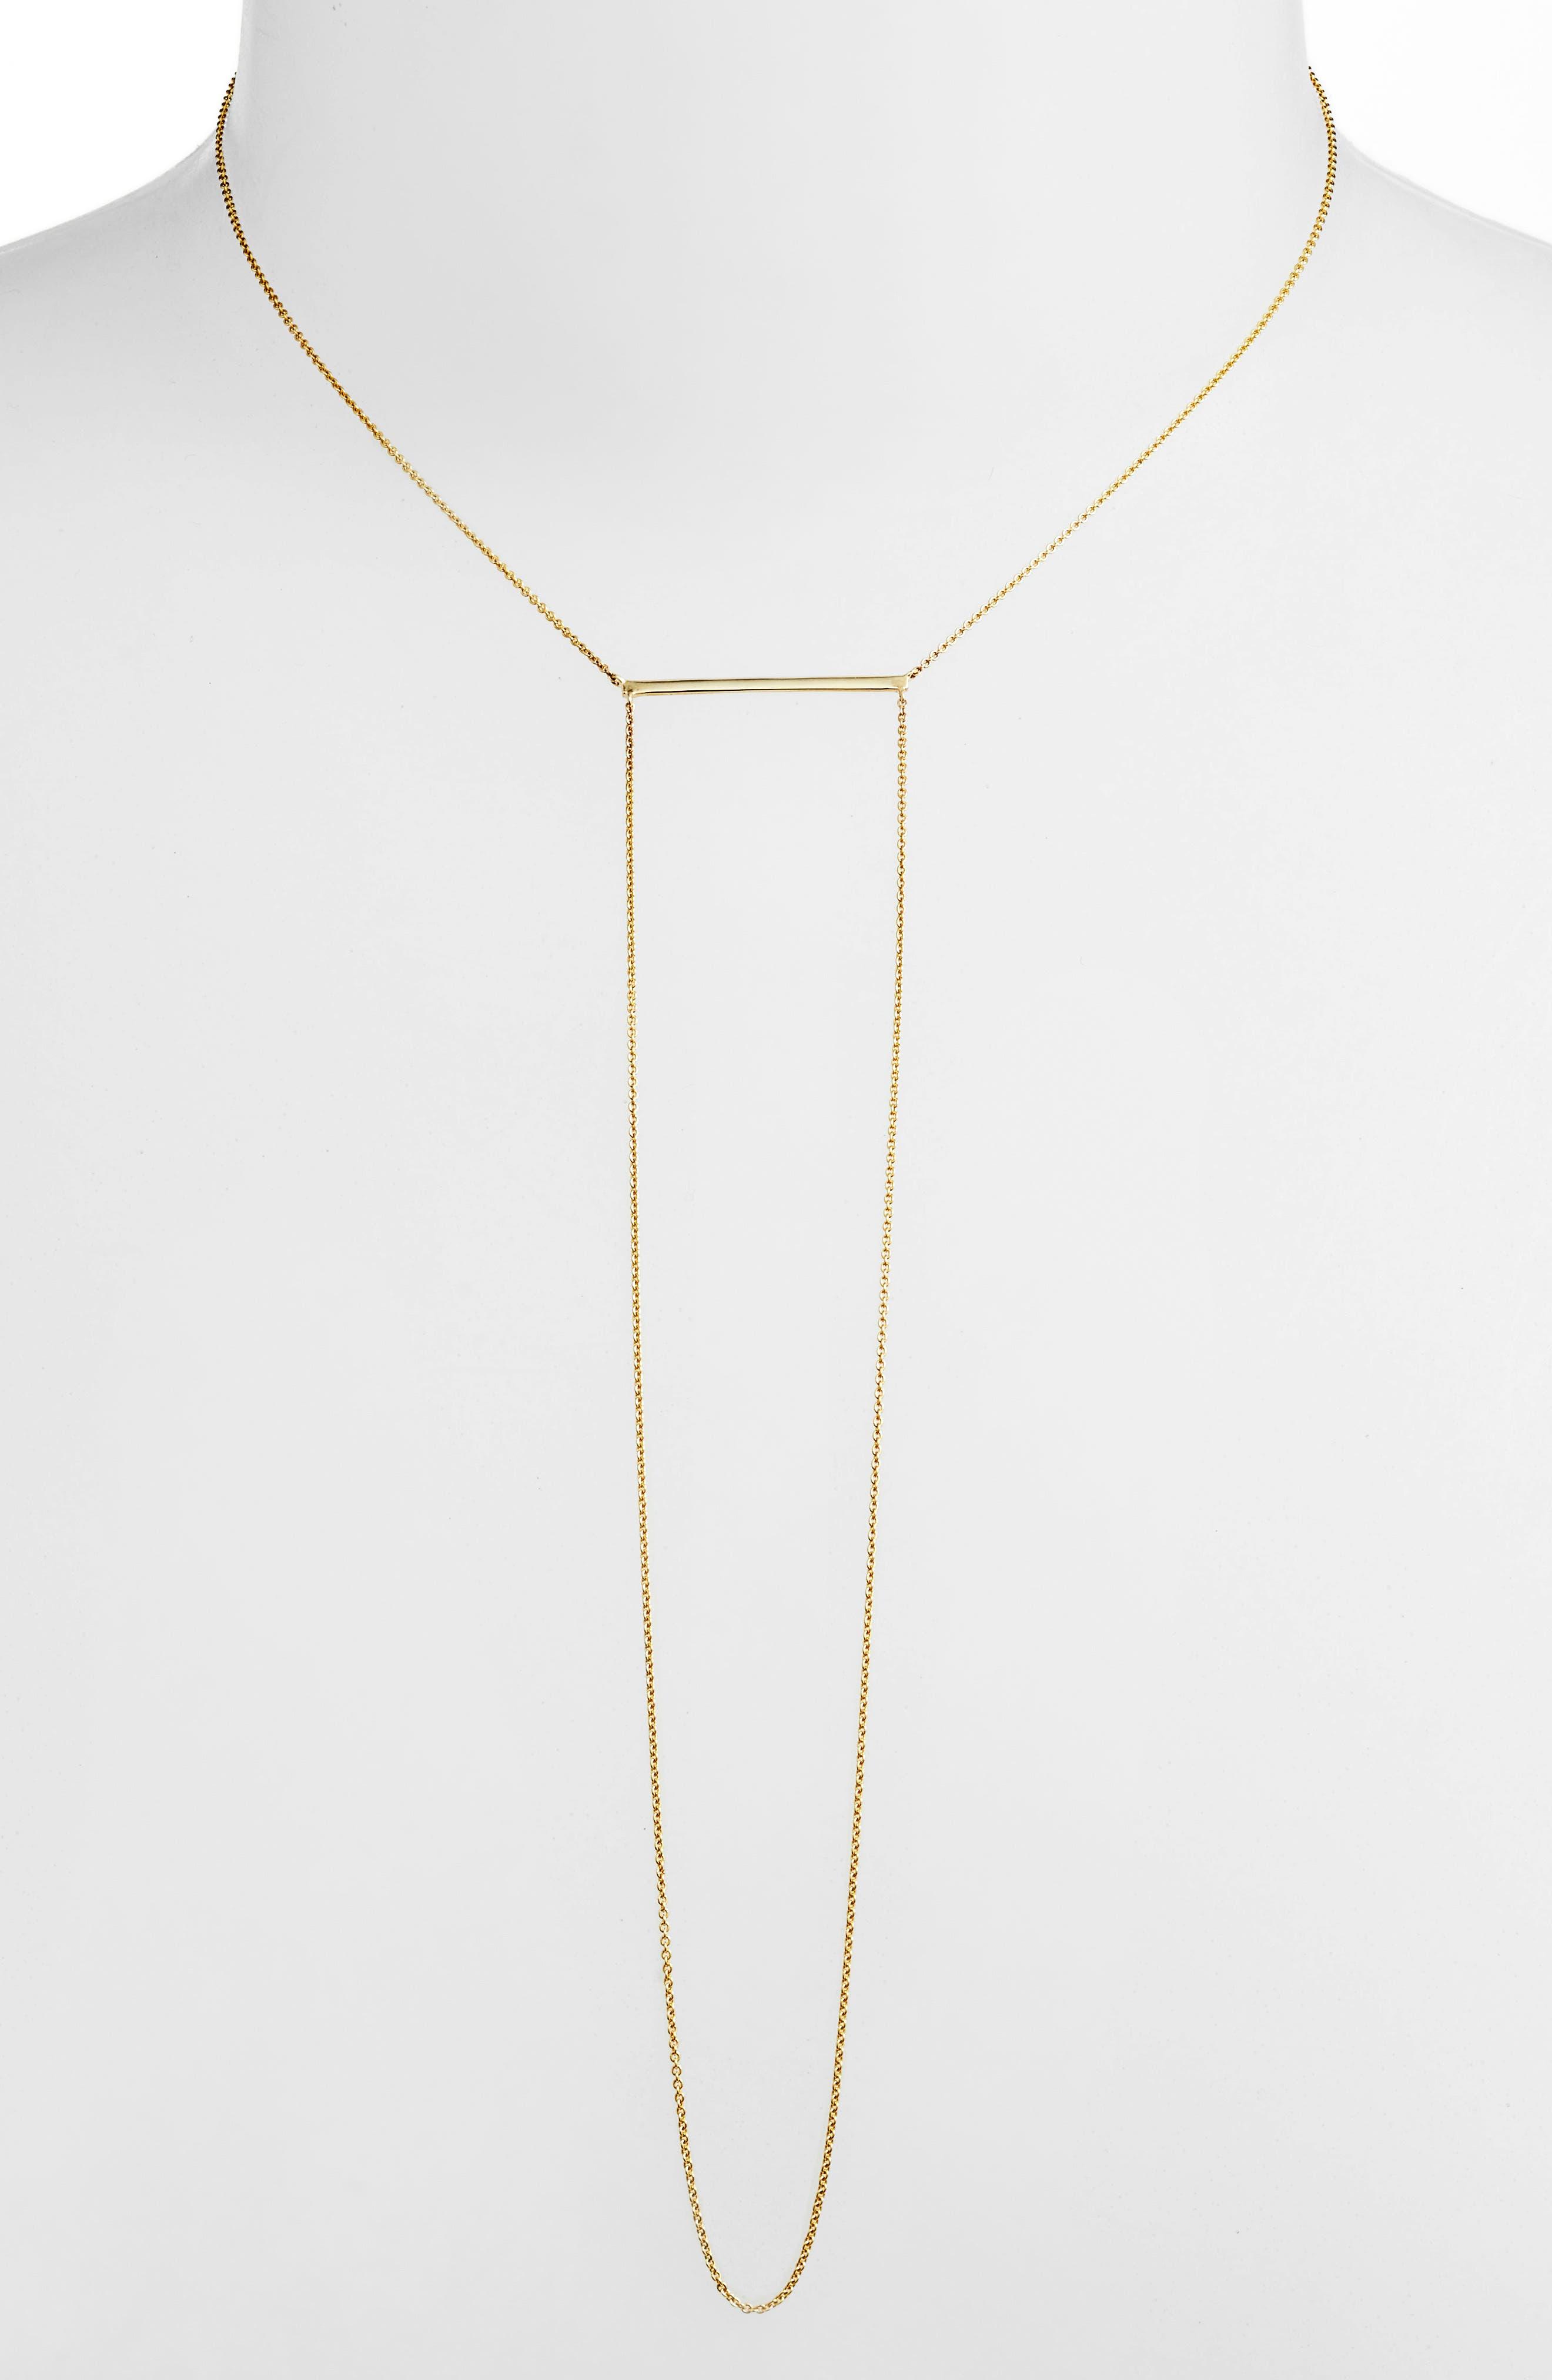 Main Image - Bony Levy Drama Bar Pendant Necklace (Nordstrom Exclusive)